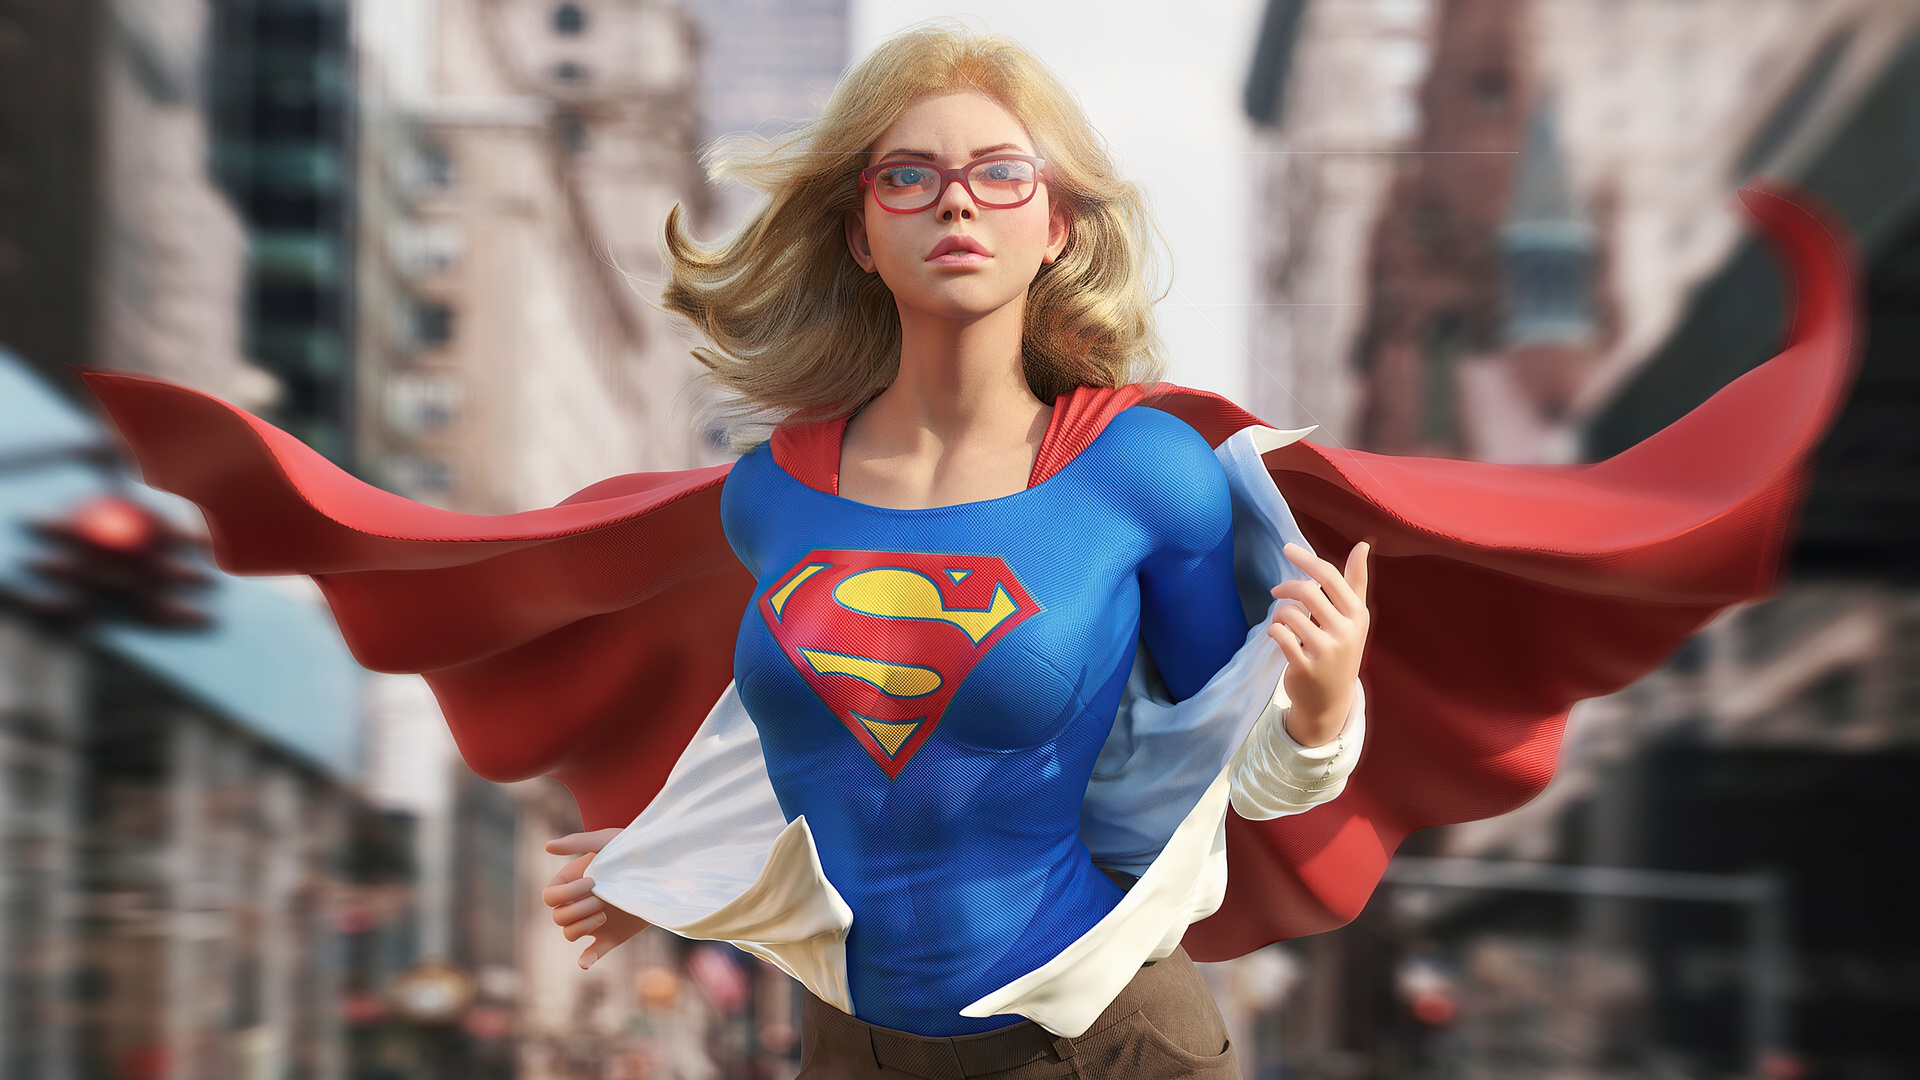 Supergirl background wallpaper